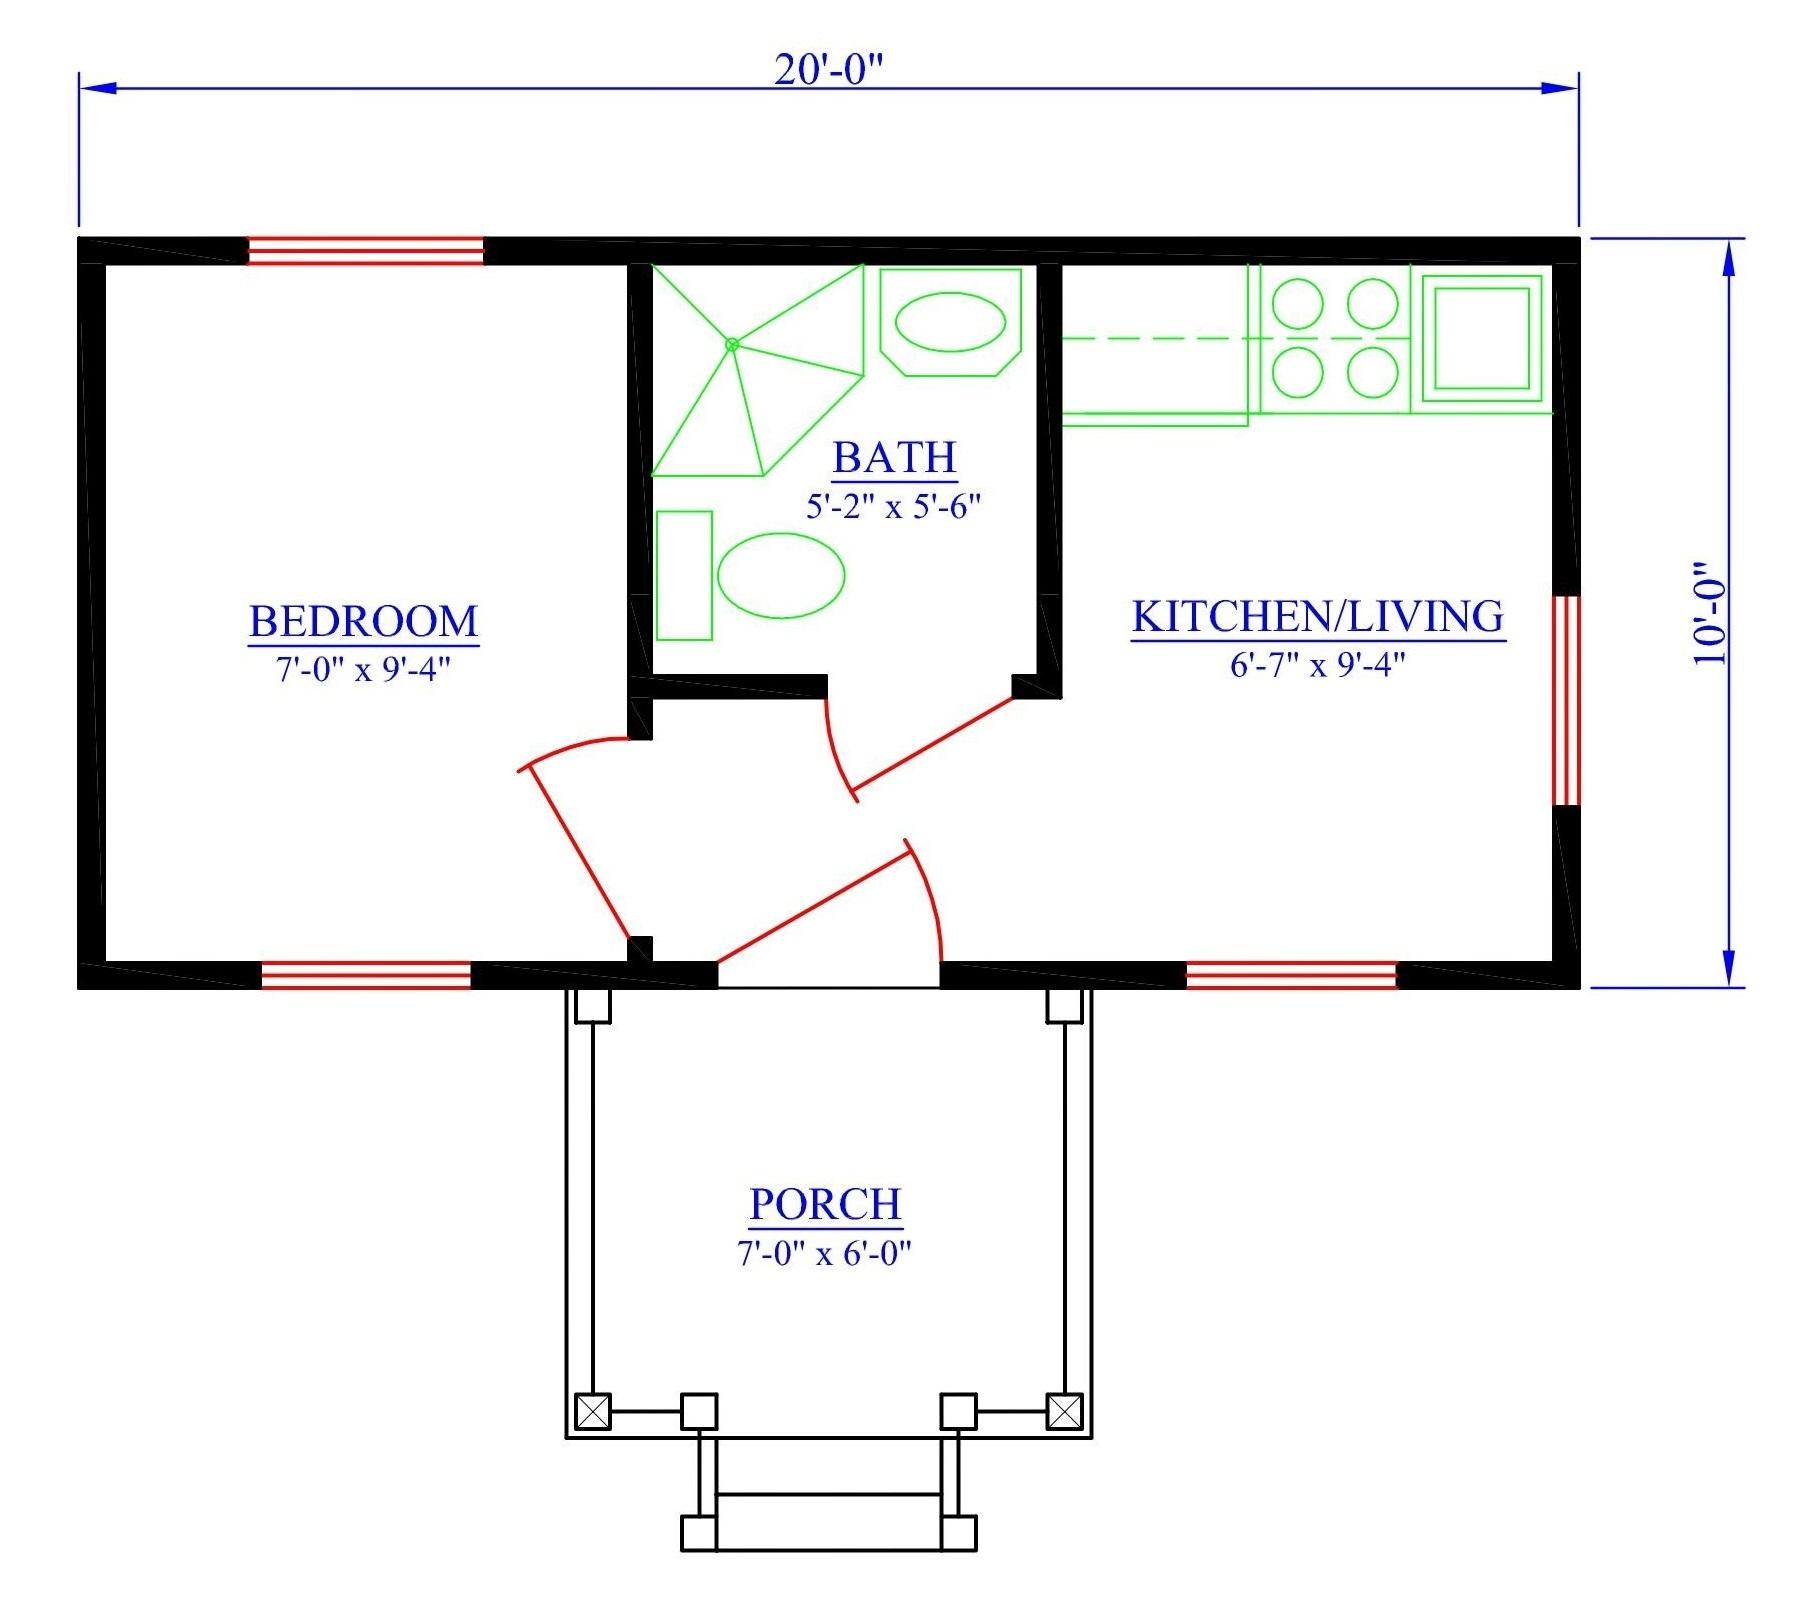 Tiny house designs the bachelor for Bachelor house plans